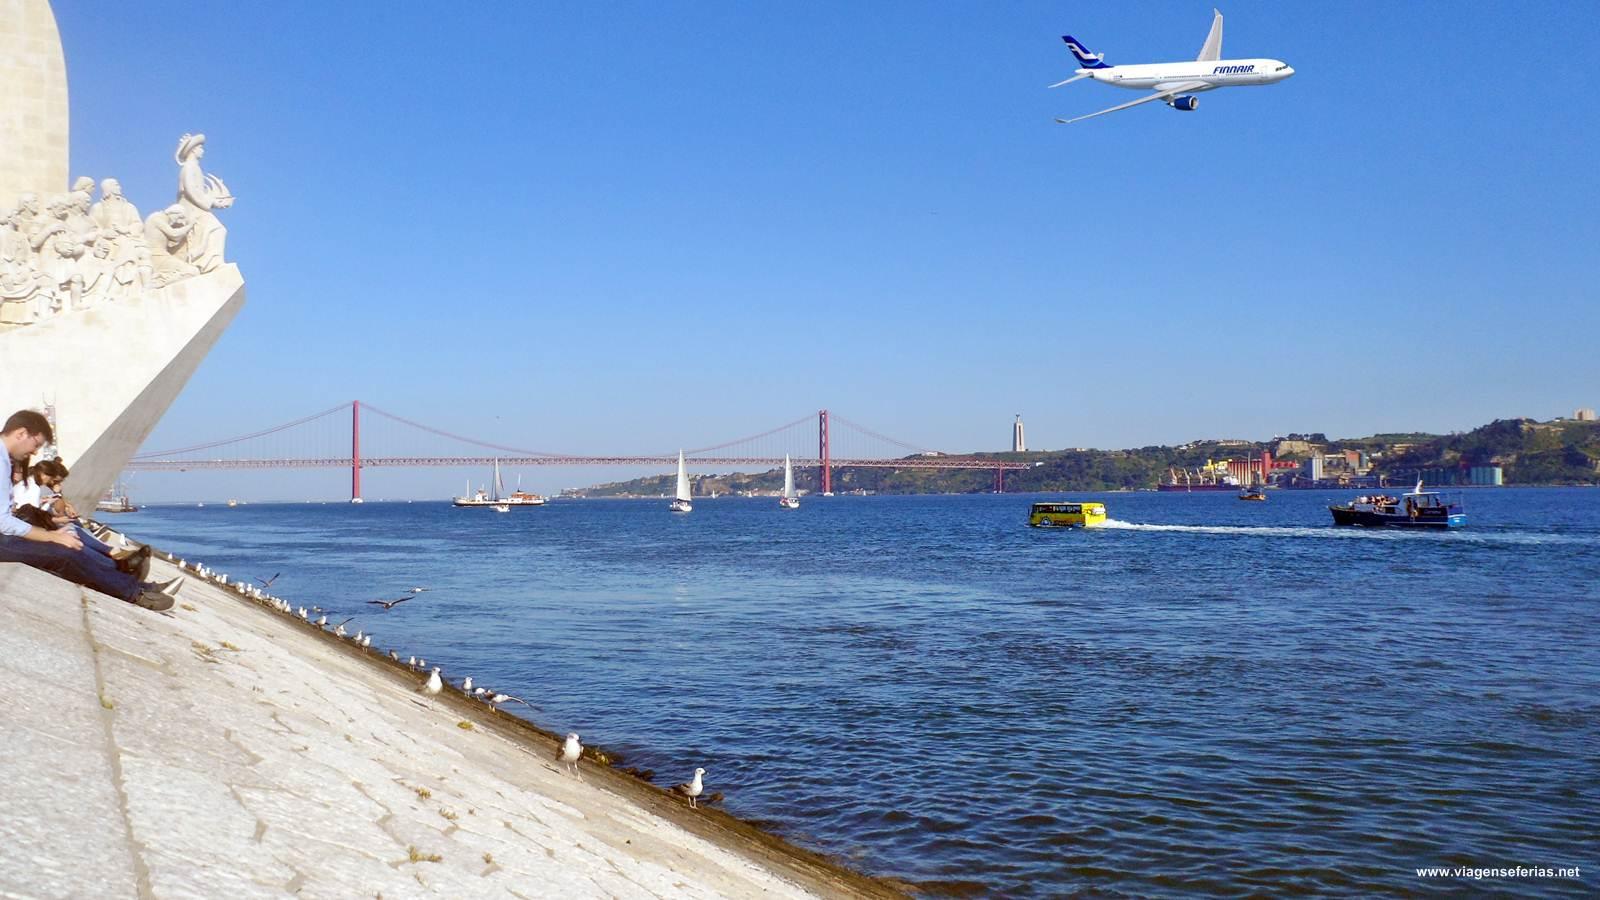 Avião da Finnair a voa sobre a cidade de Lisboa